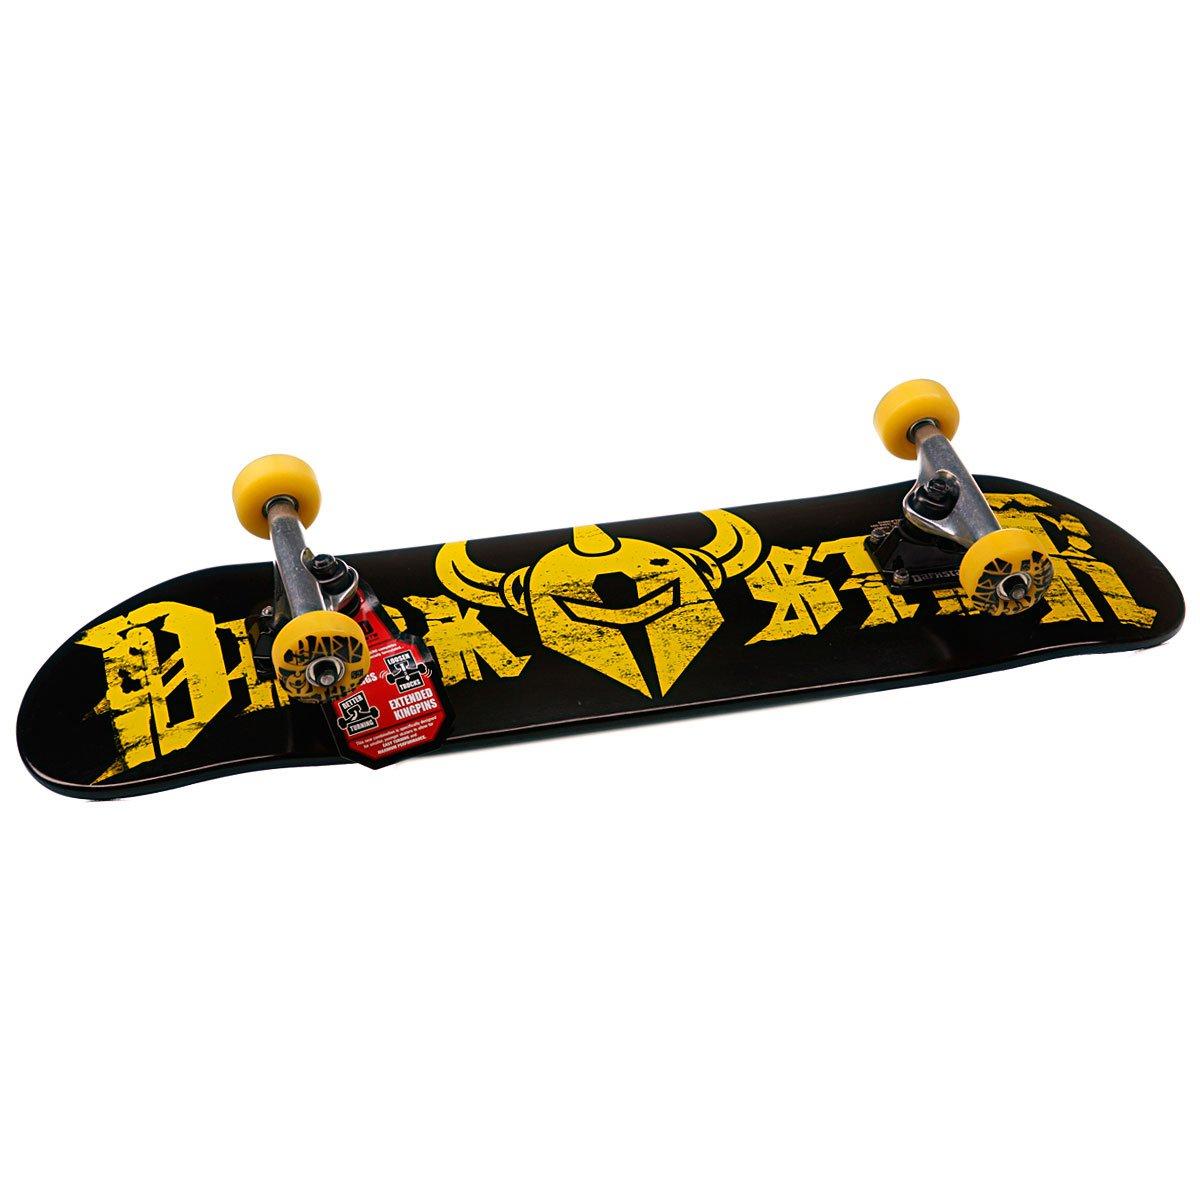 b7f05656d06811 Скейтборд в сборе Darkstar Ruin Youth Mid Fp Yellow Mid 7.3(18.5 см) ...